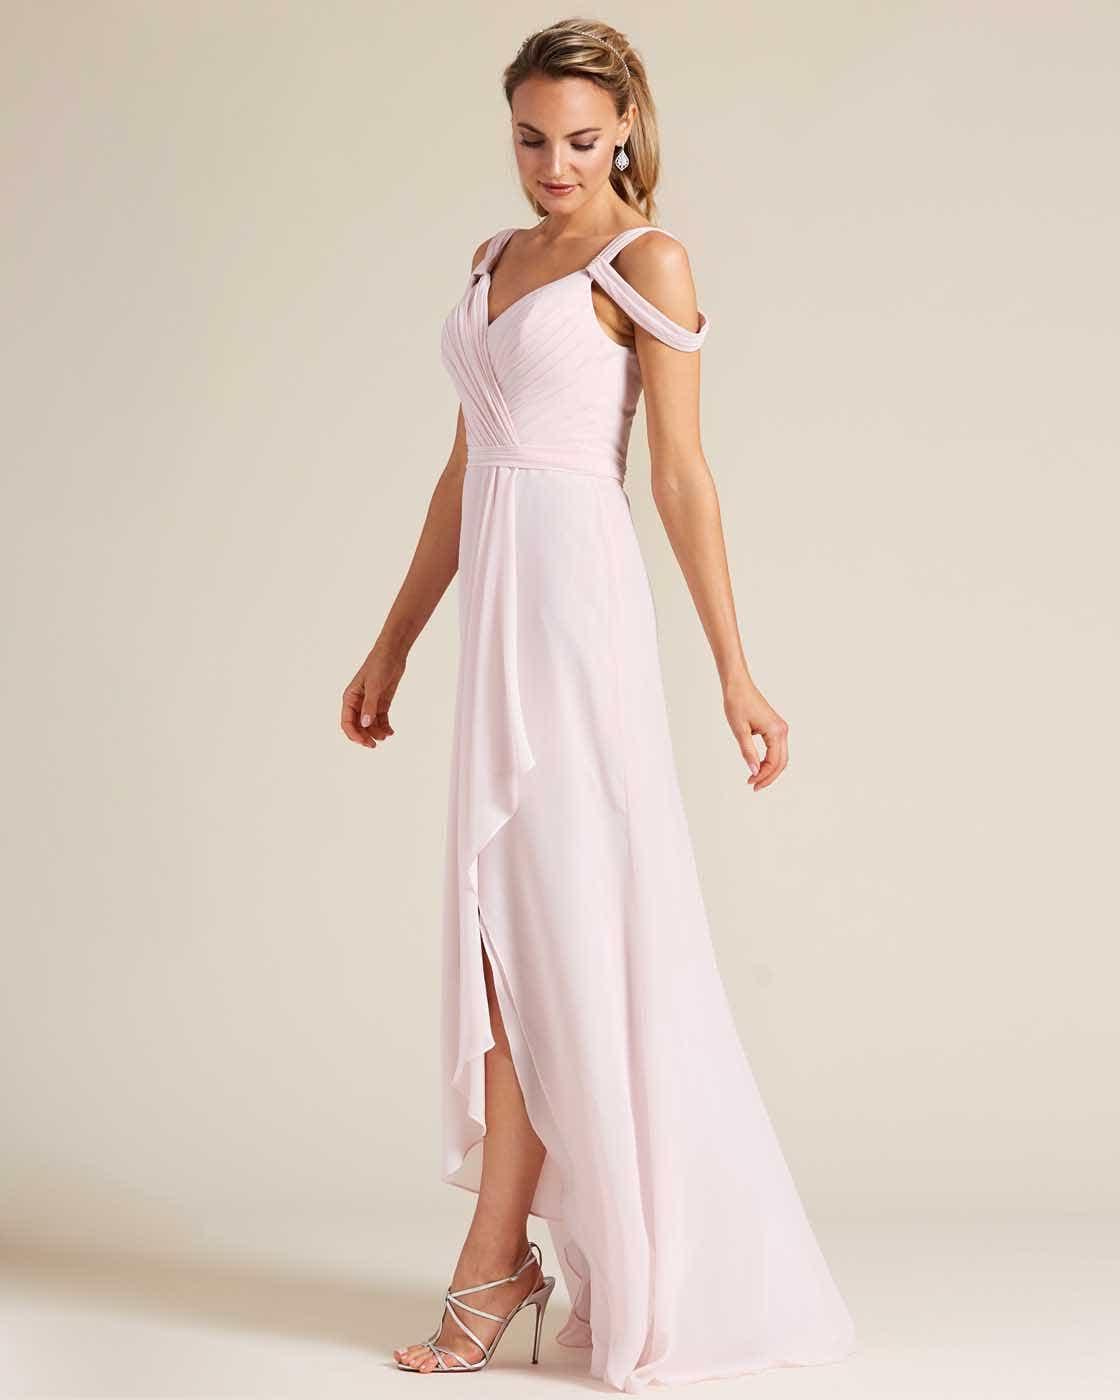 Light Pink Multi Strap Ruched Top Dress - Side